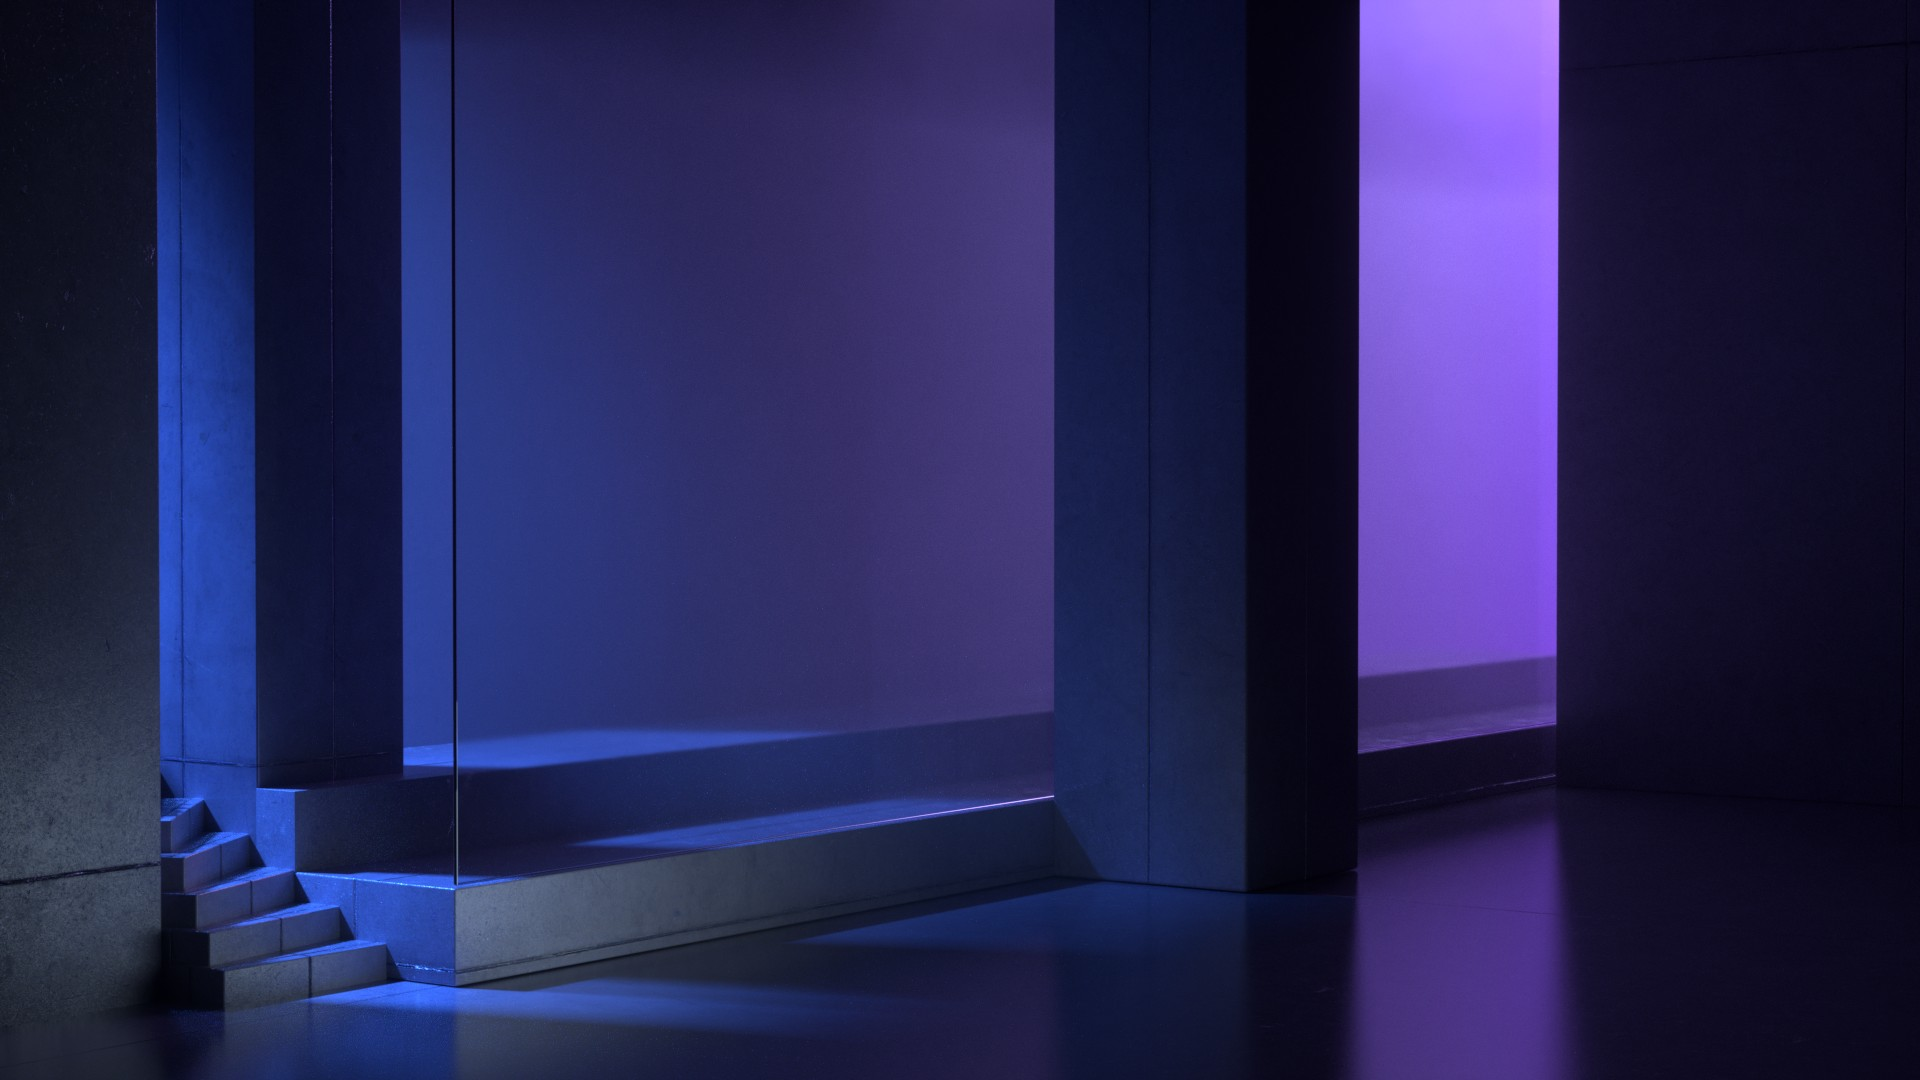 VU_AC_Environment_Wide_Lookdev_v023_Blue_Fog